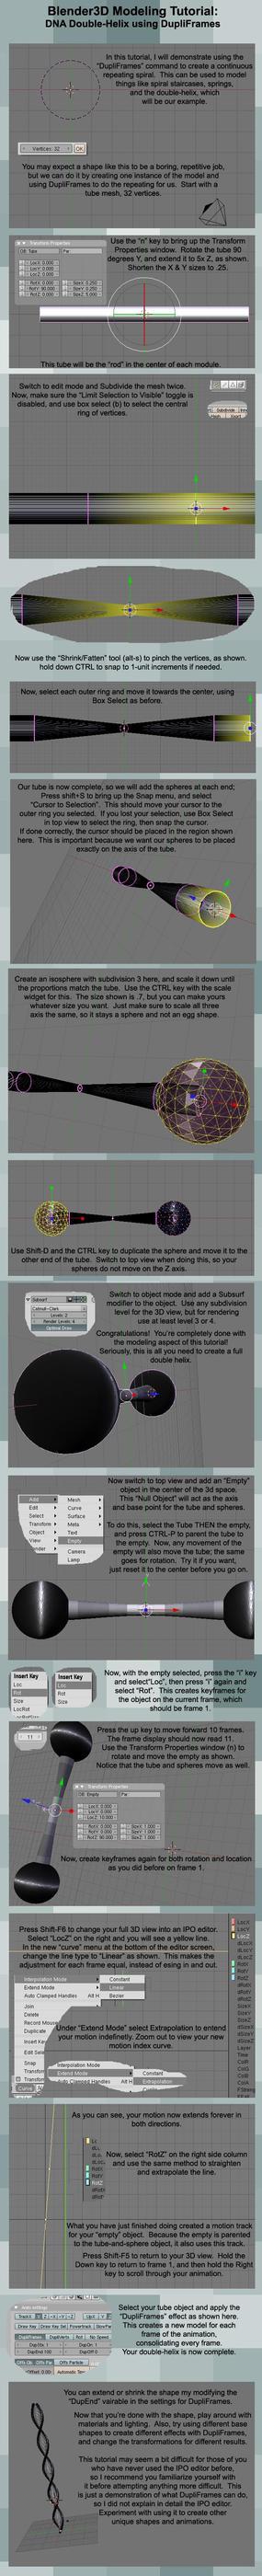 Blender Modeling: Double-Helix by Ci-Blender